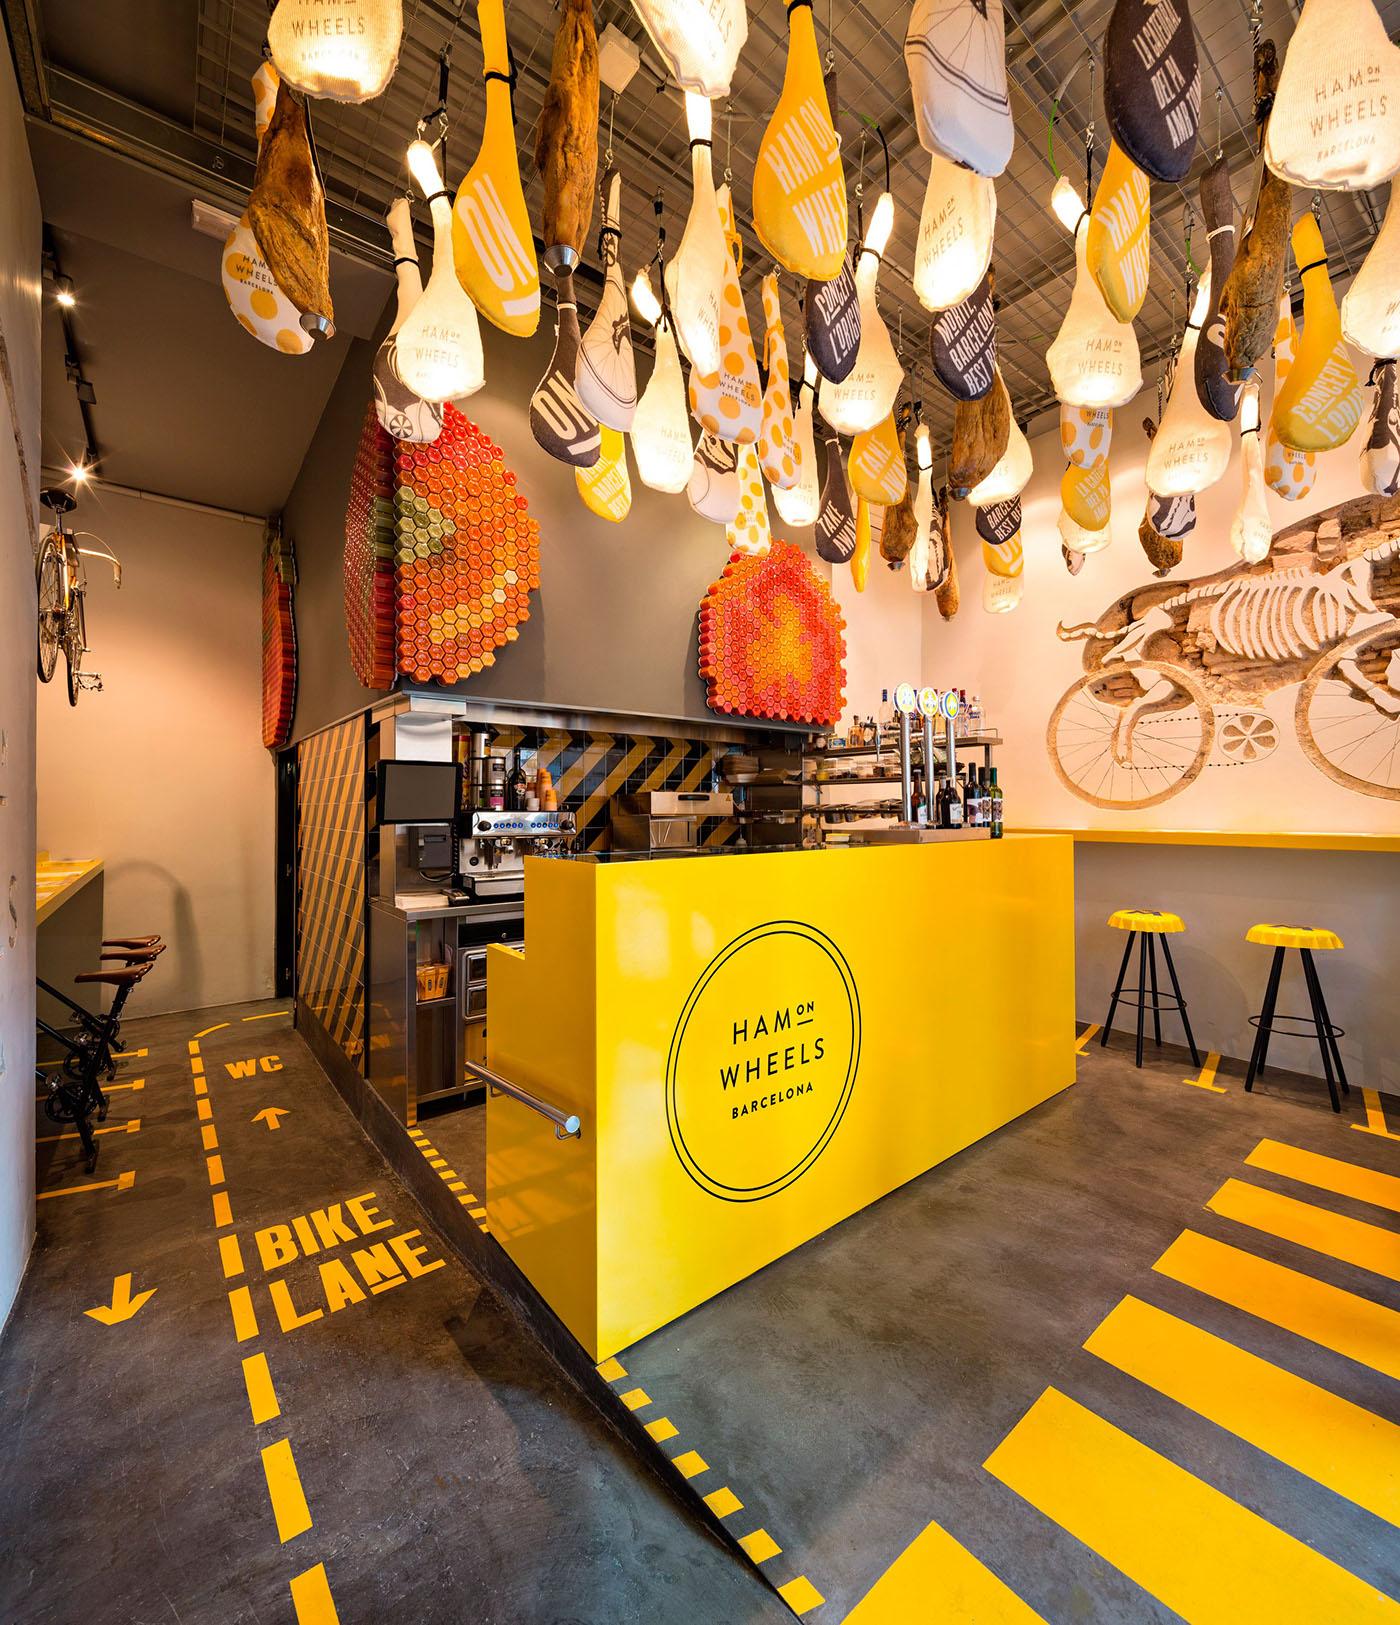 hamonwheels hamon jamon wheels restaurant fastfood premium premiumfastfood barcelona Bicycle identity yellow